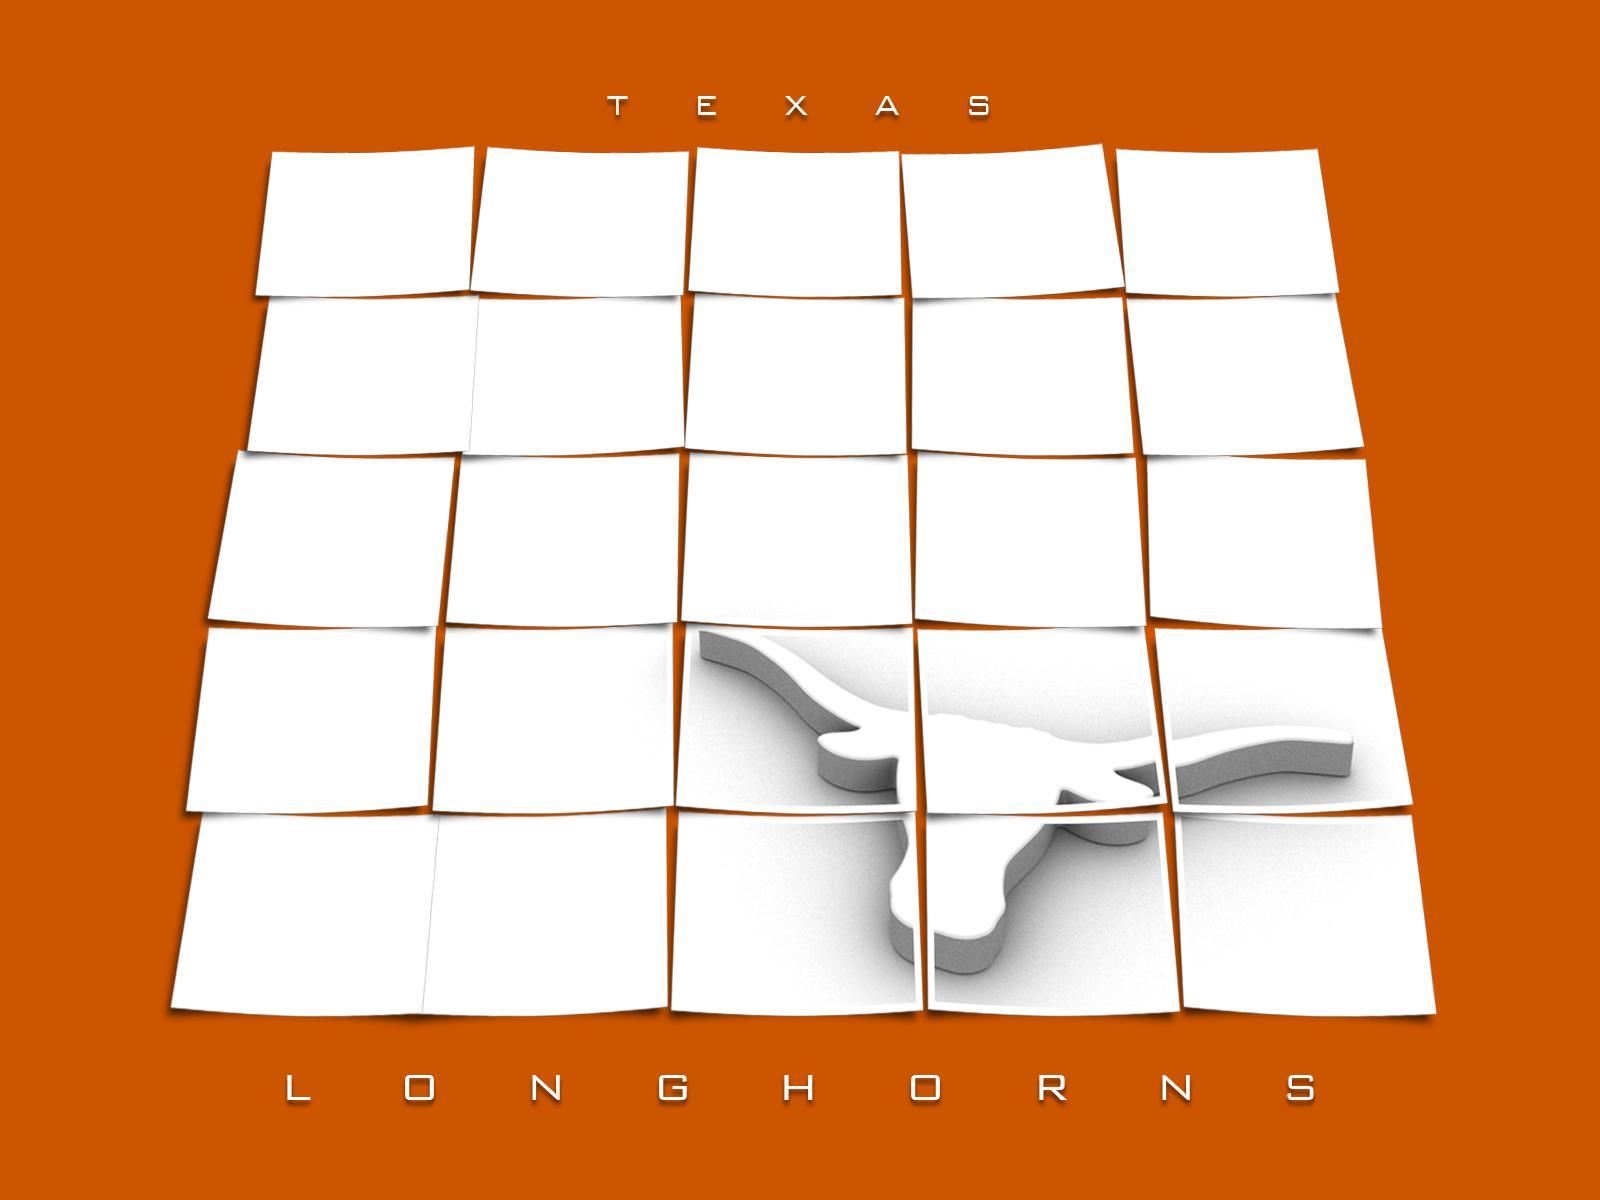 University of Texas wallpapers University of Texas stock photos 1600x1200